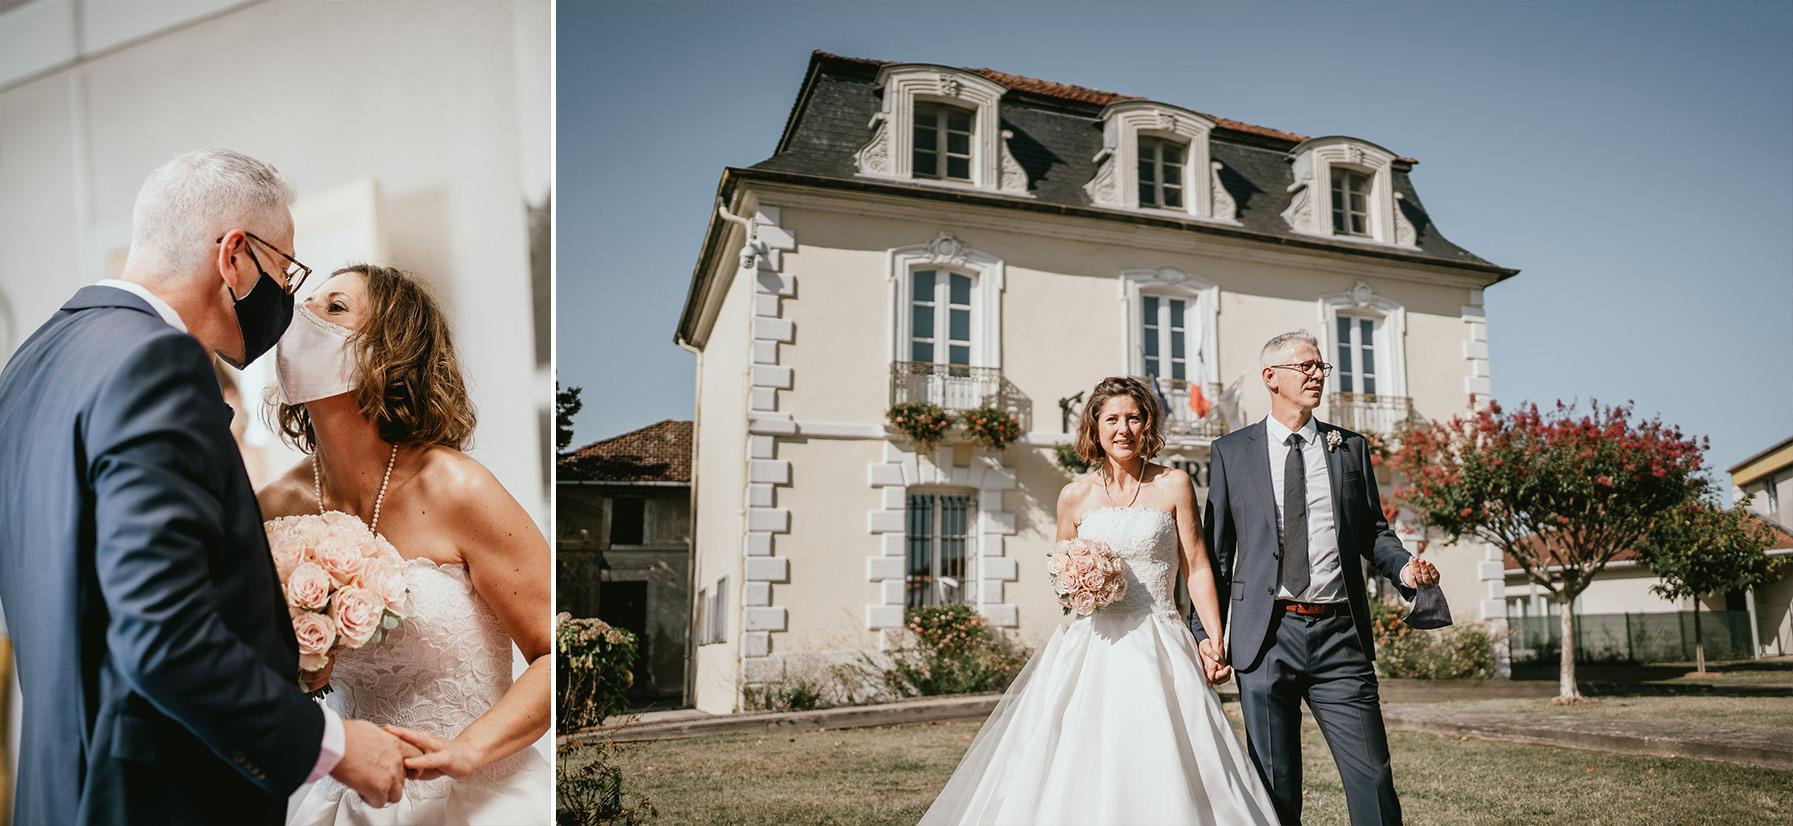 Photographe mariage landes dax aquitaine